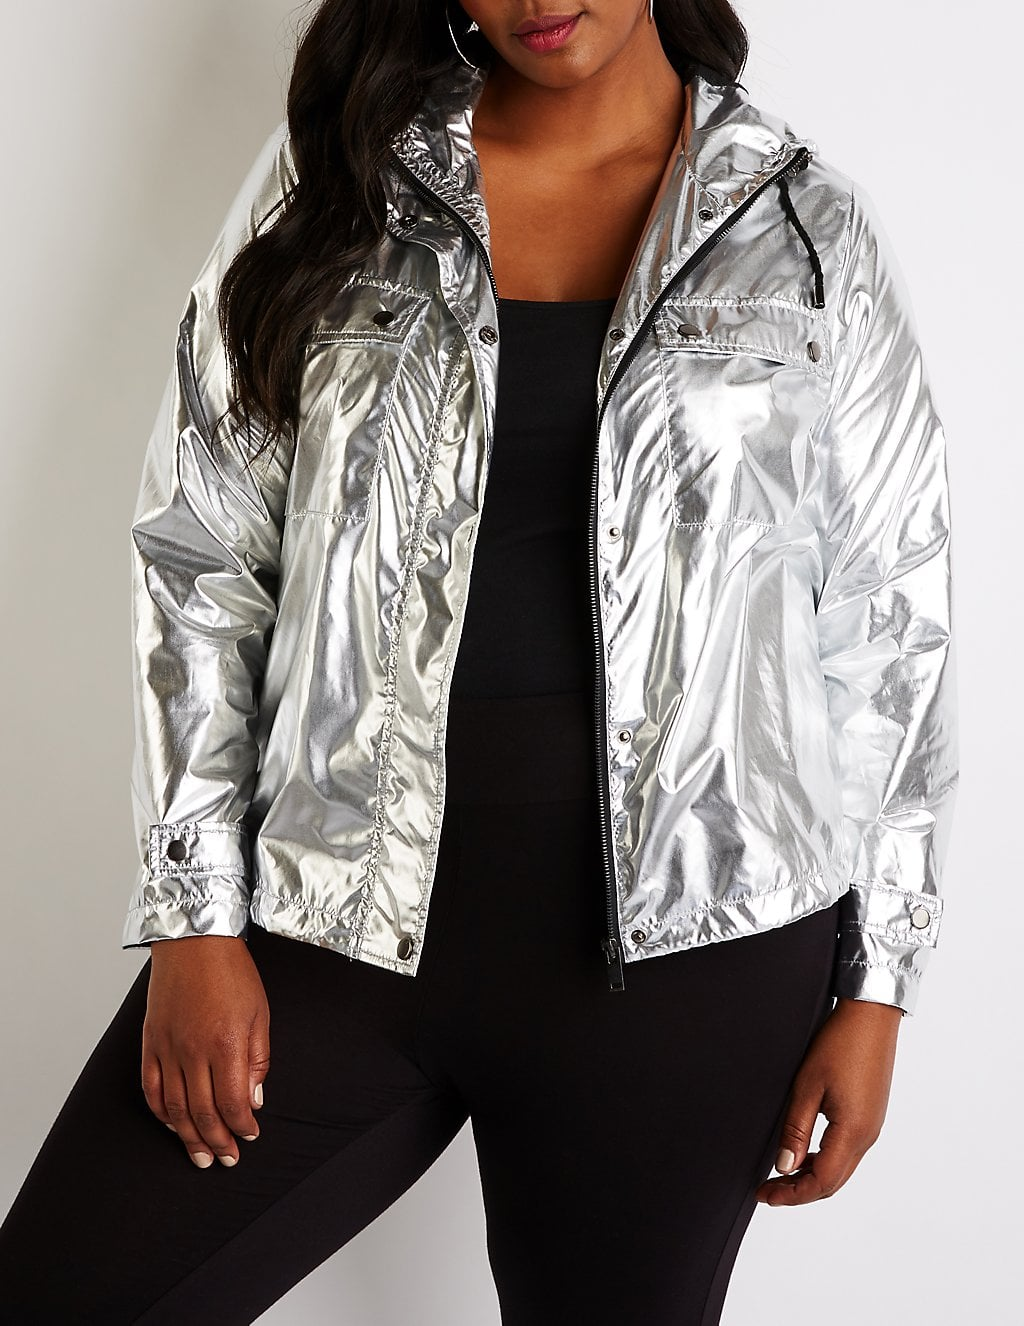 8a0726f7deb Charlotte Russe Metallic Hooded Parka Jacket   Sure, Kourtney ...